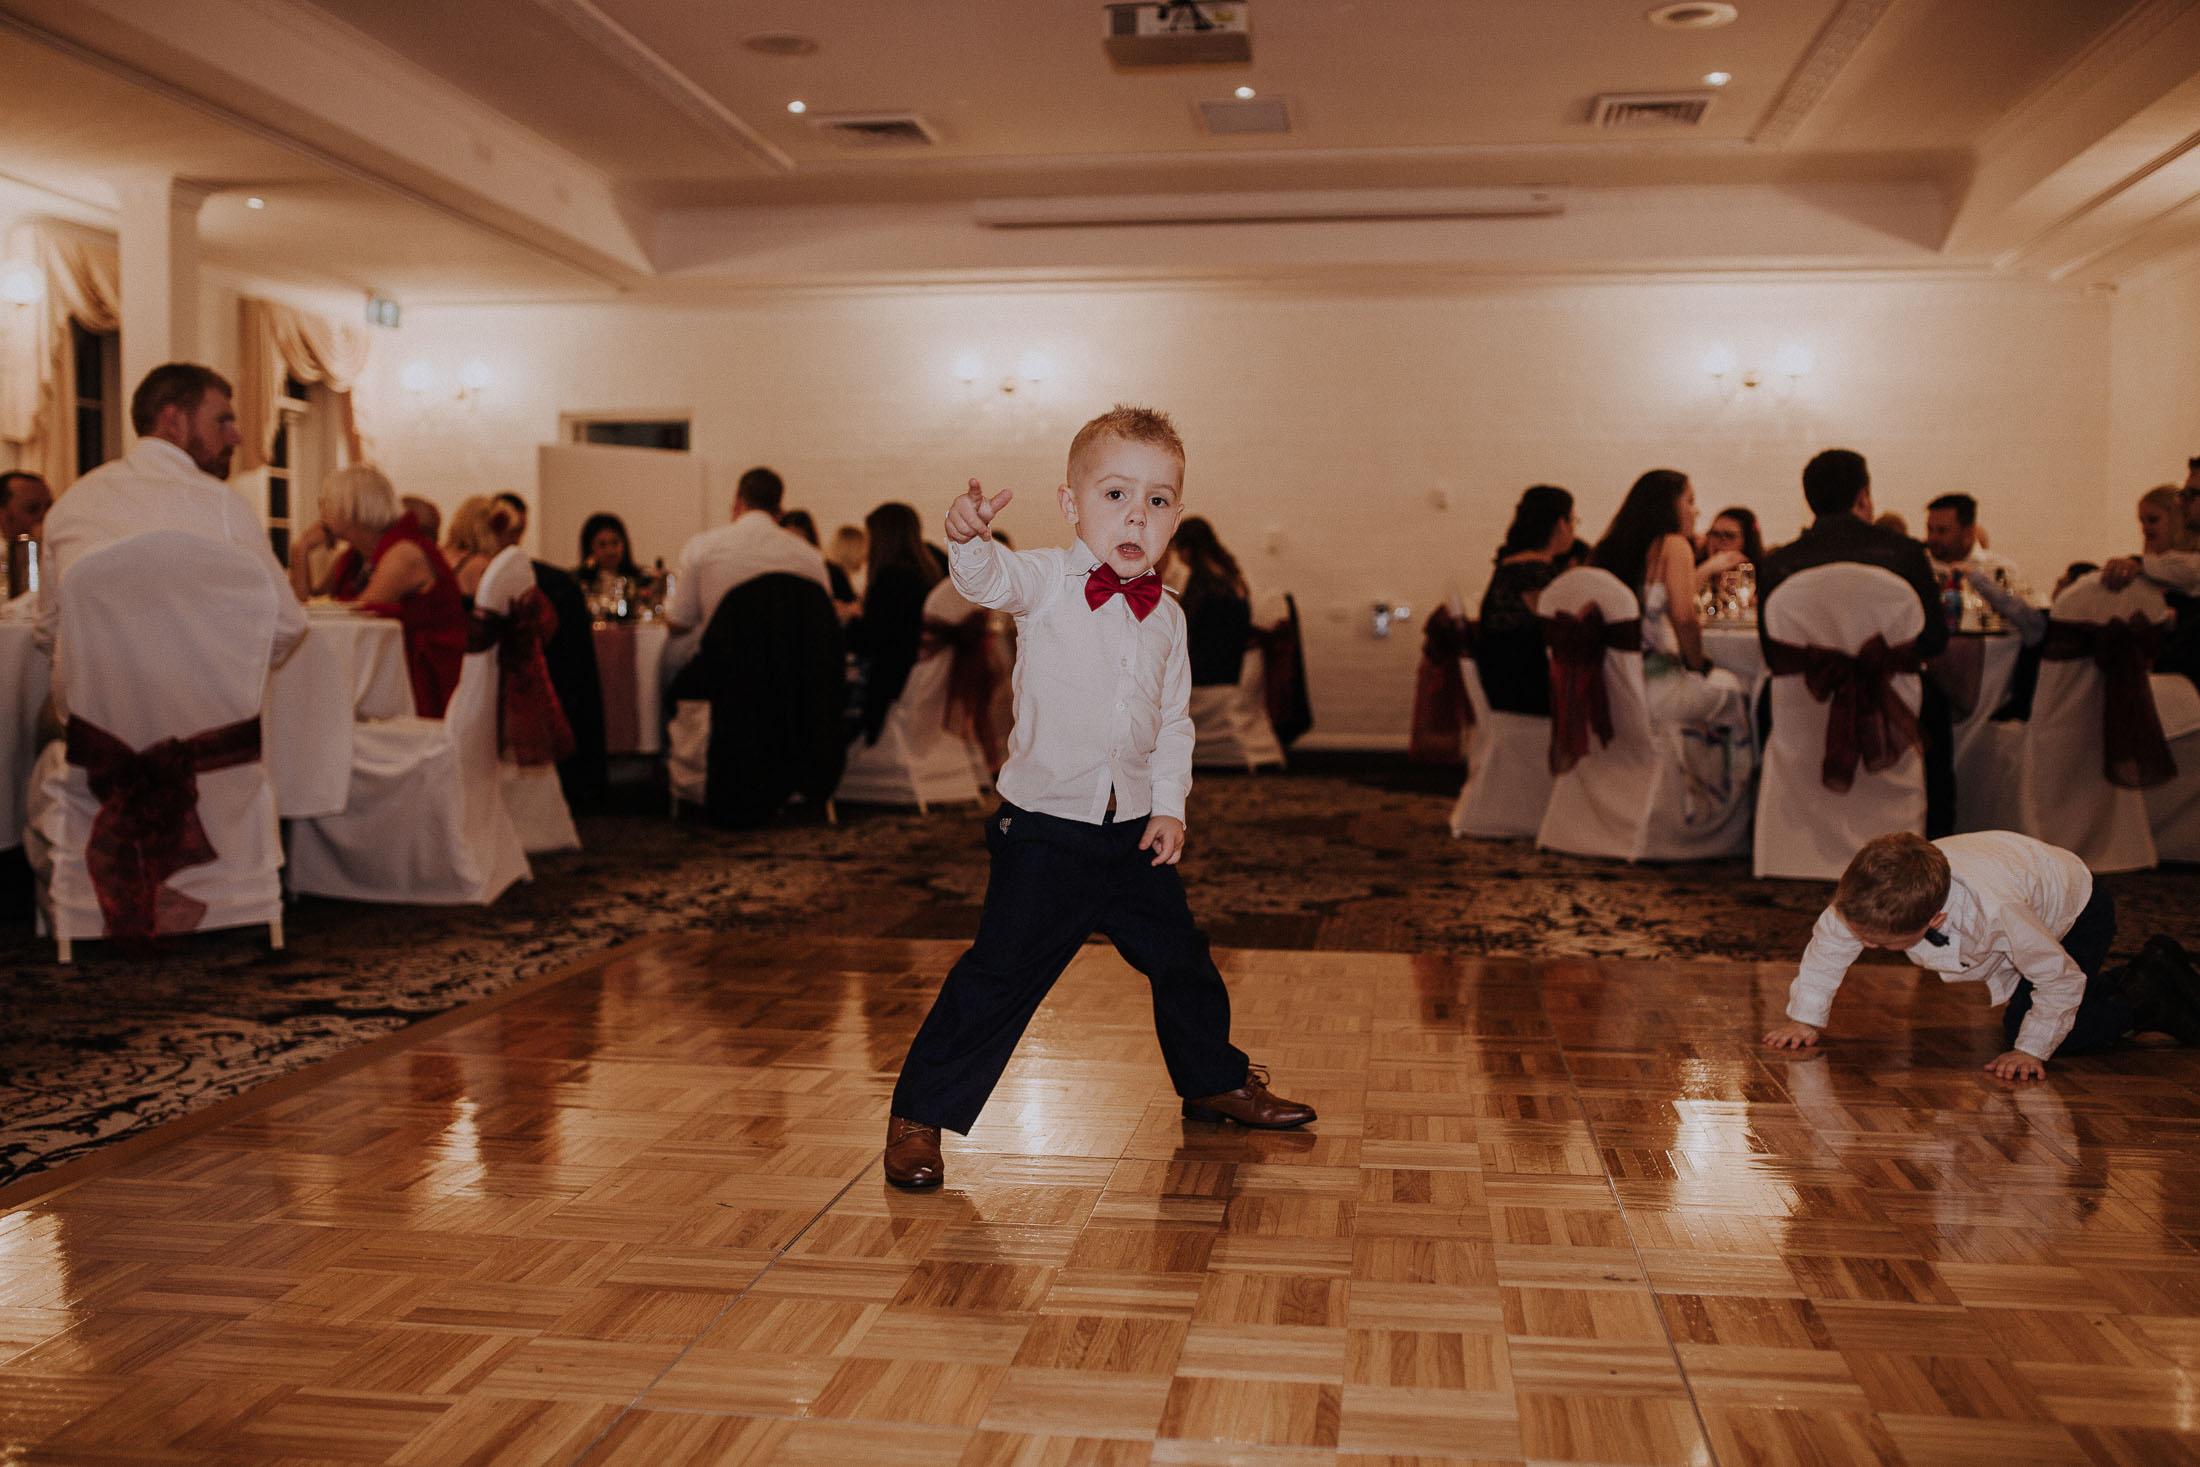 dancing-wedding.jpg